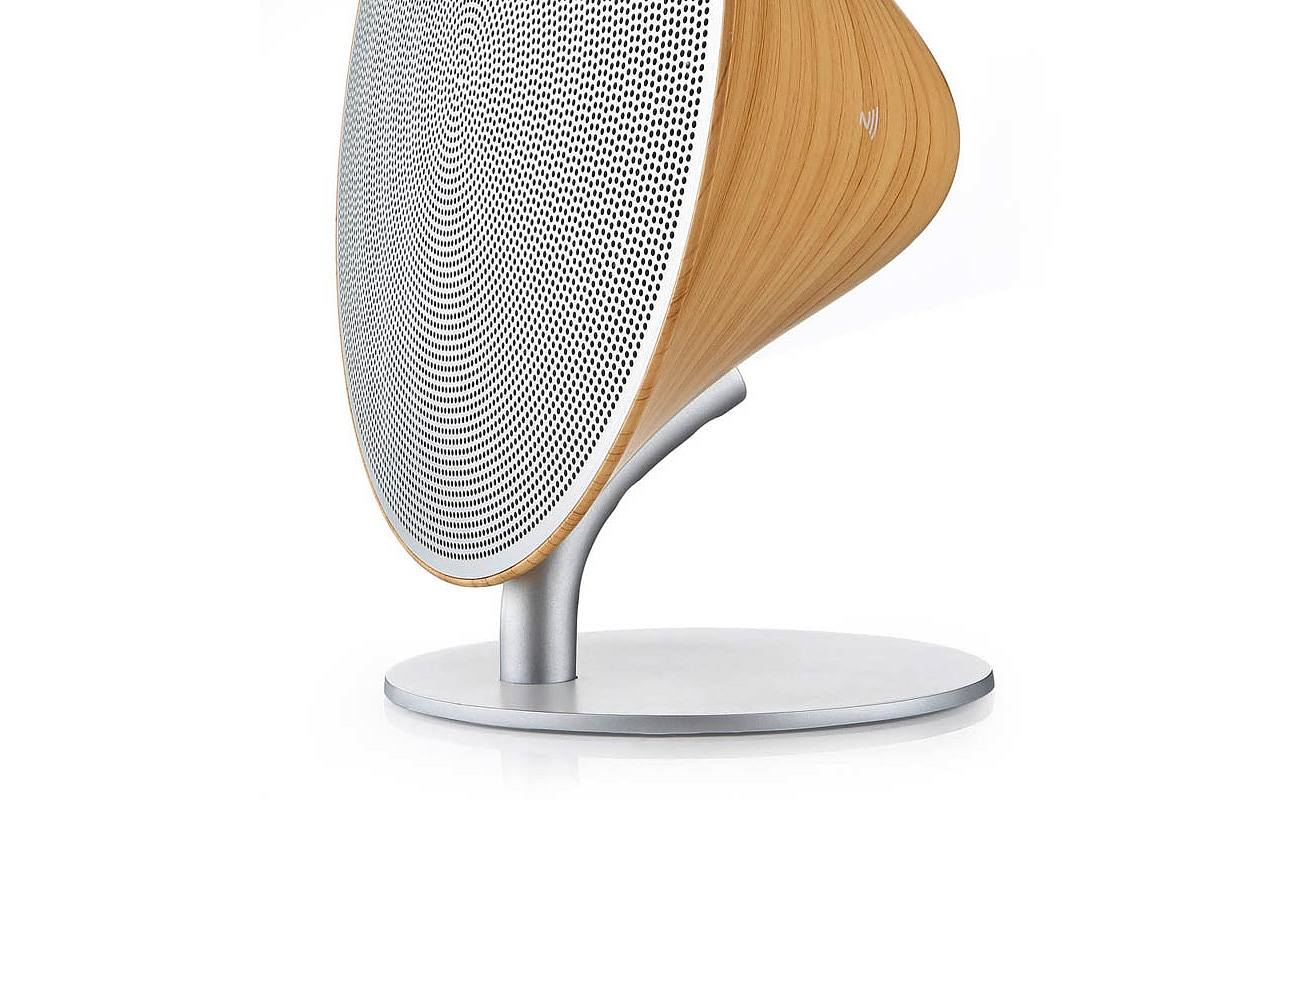 Wooden Vintage Wireless Speakers